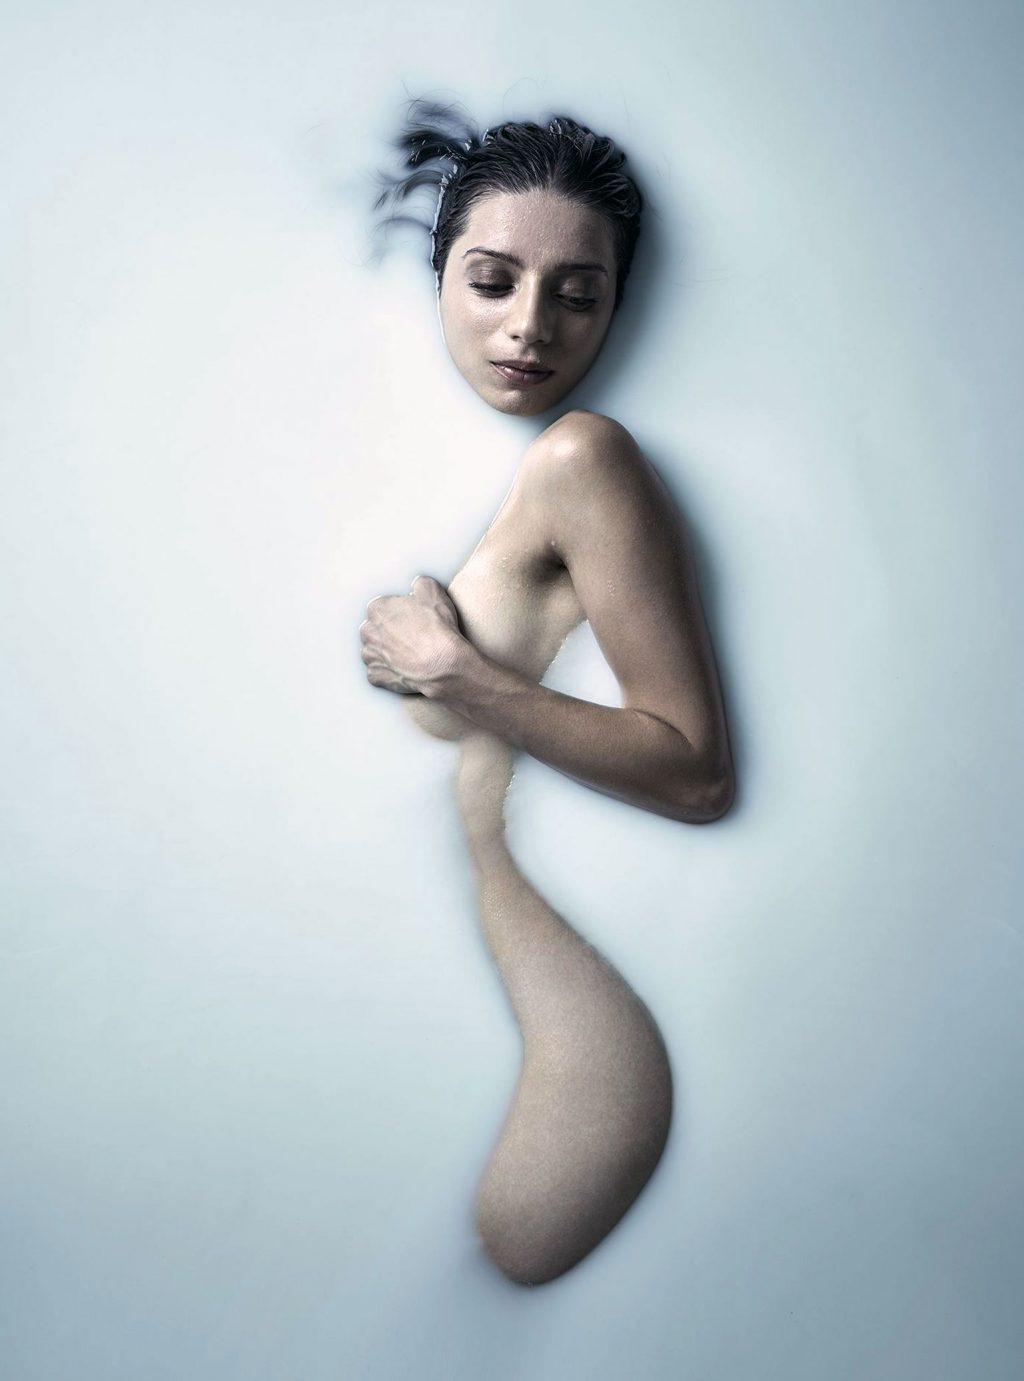 Angela Sarafyan butt